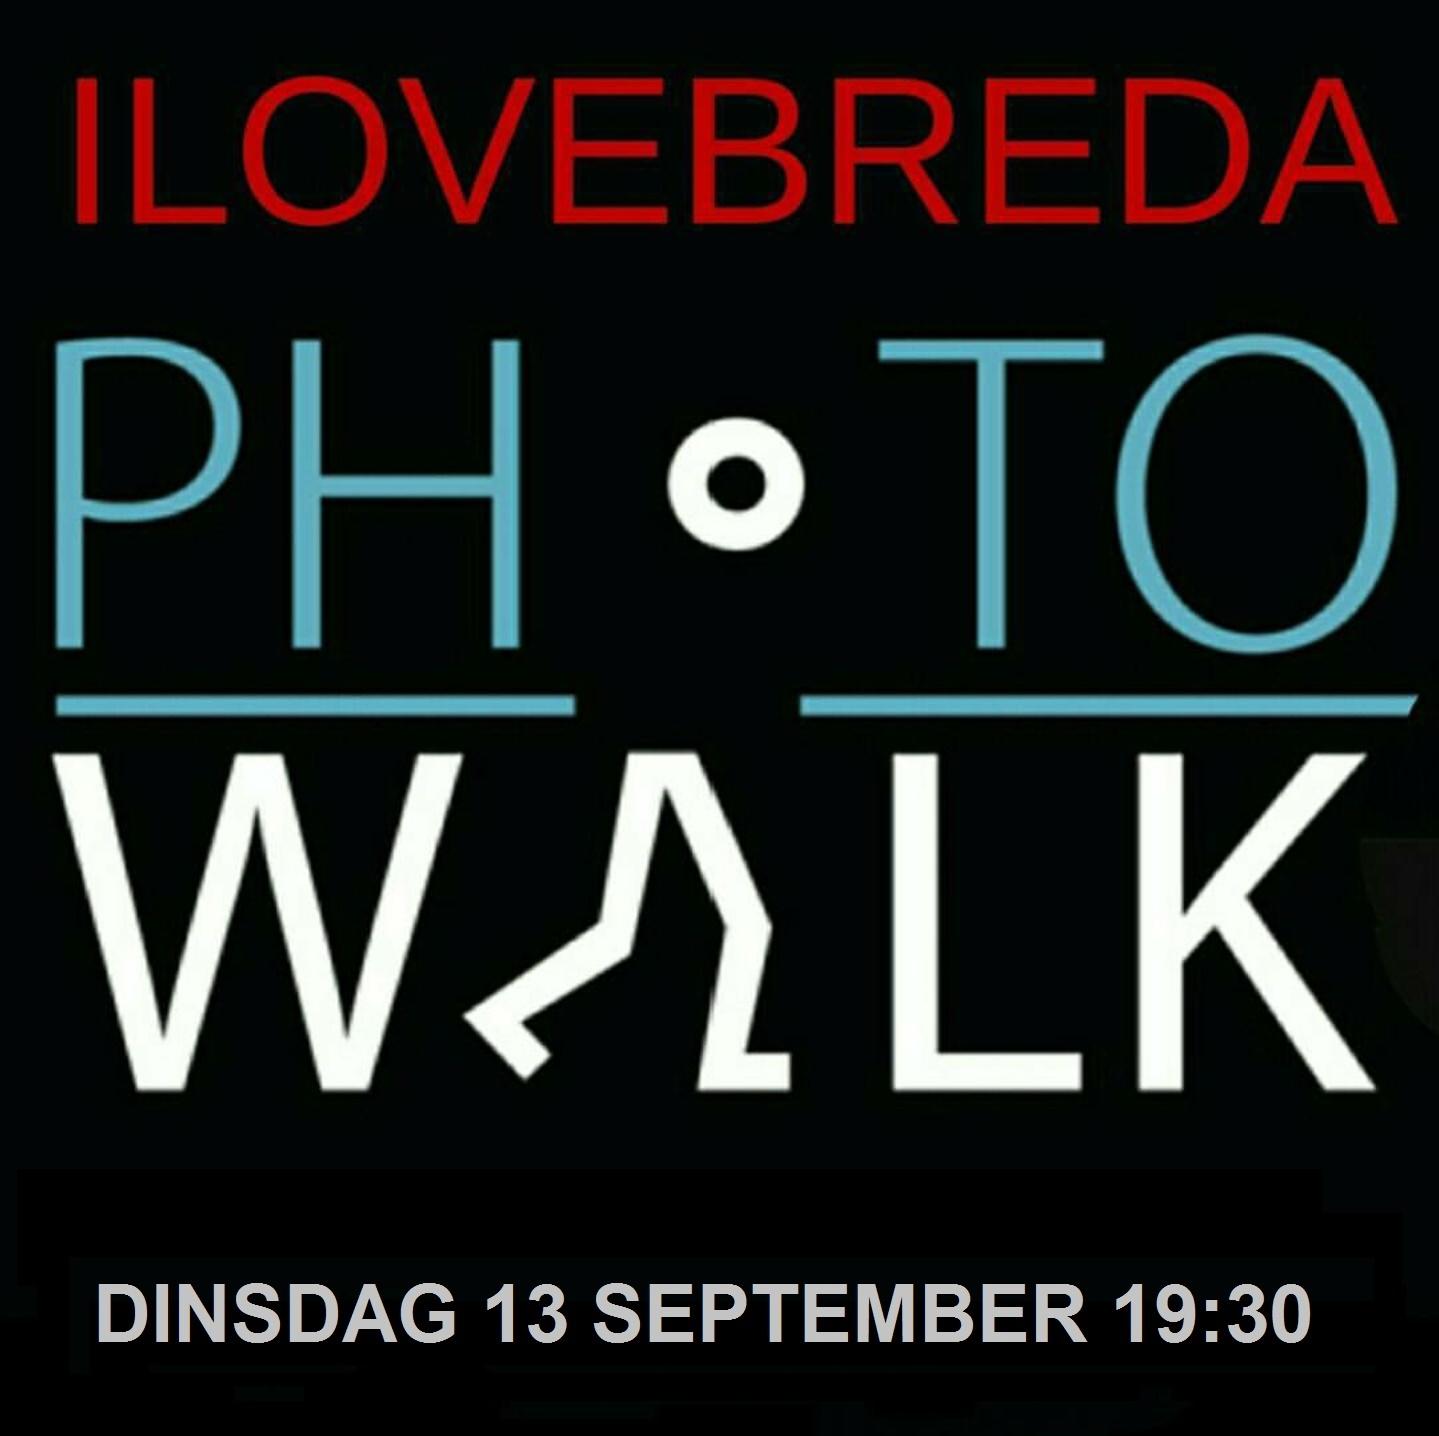 ILoveBreda Photowalk